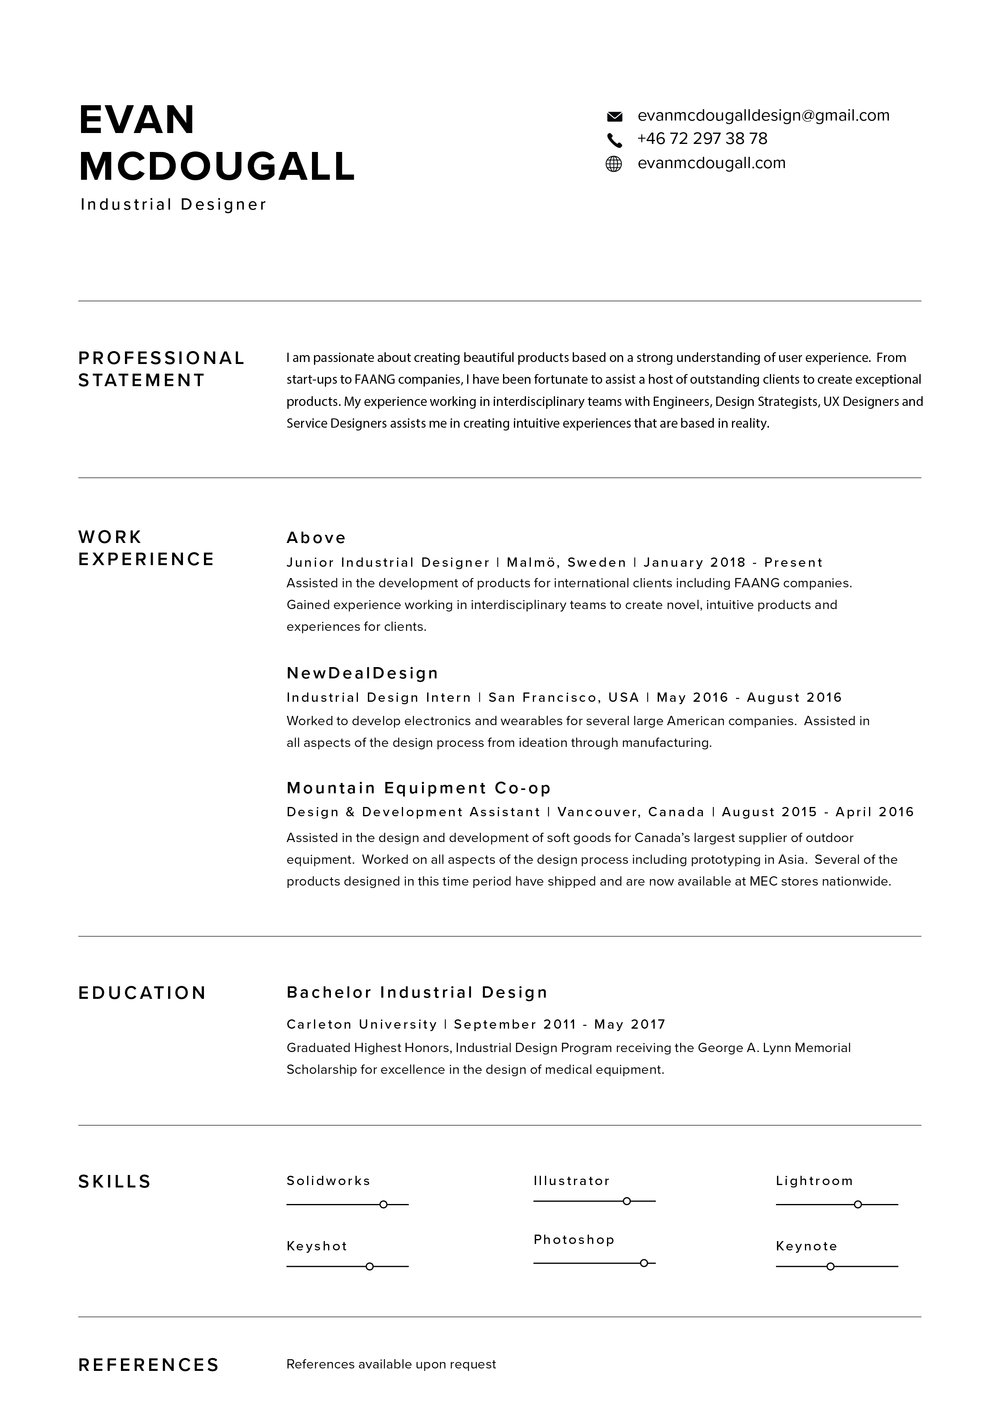 Evan McDougall - Resume